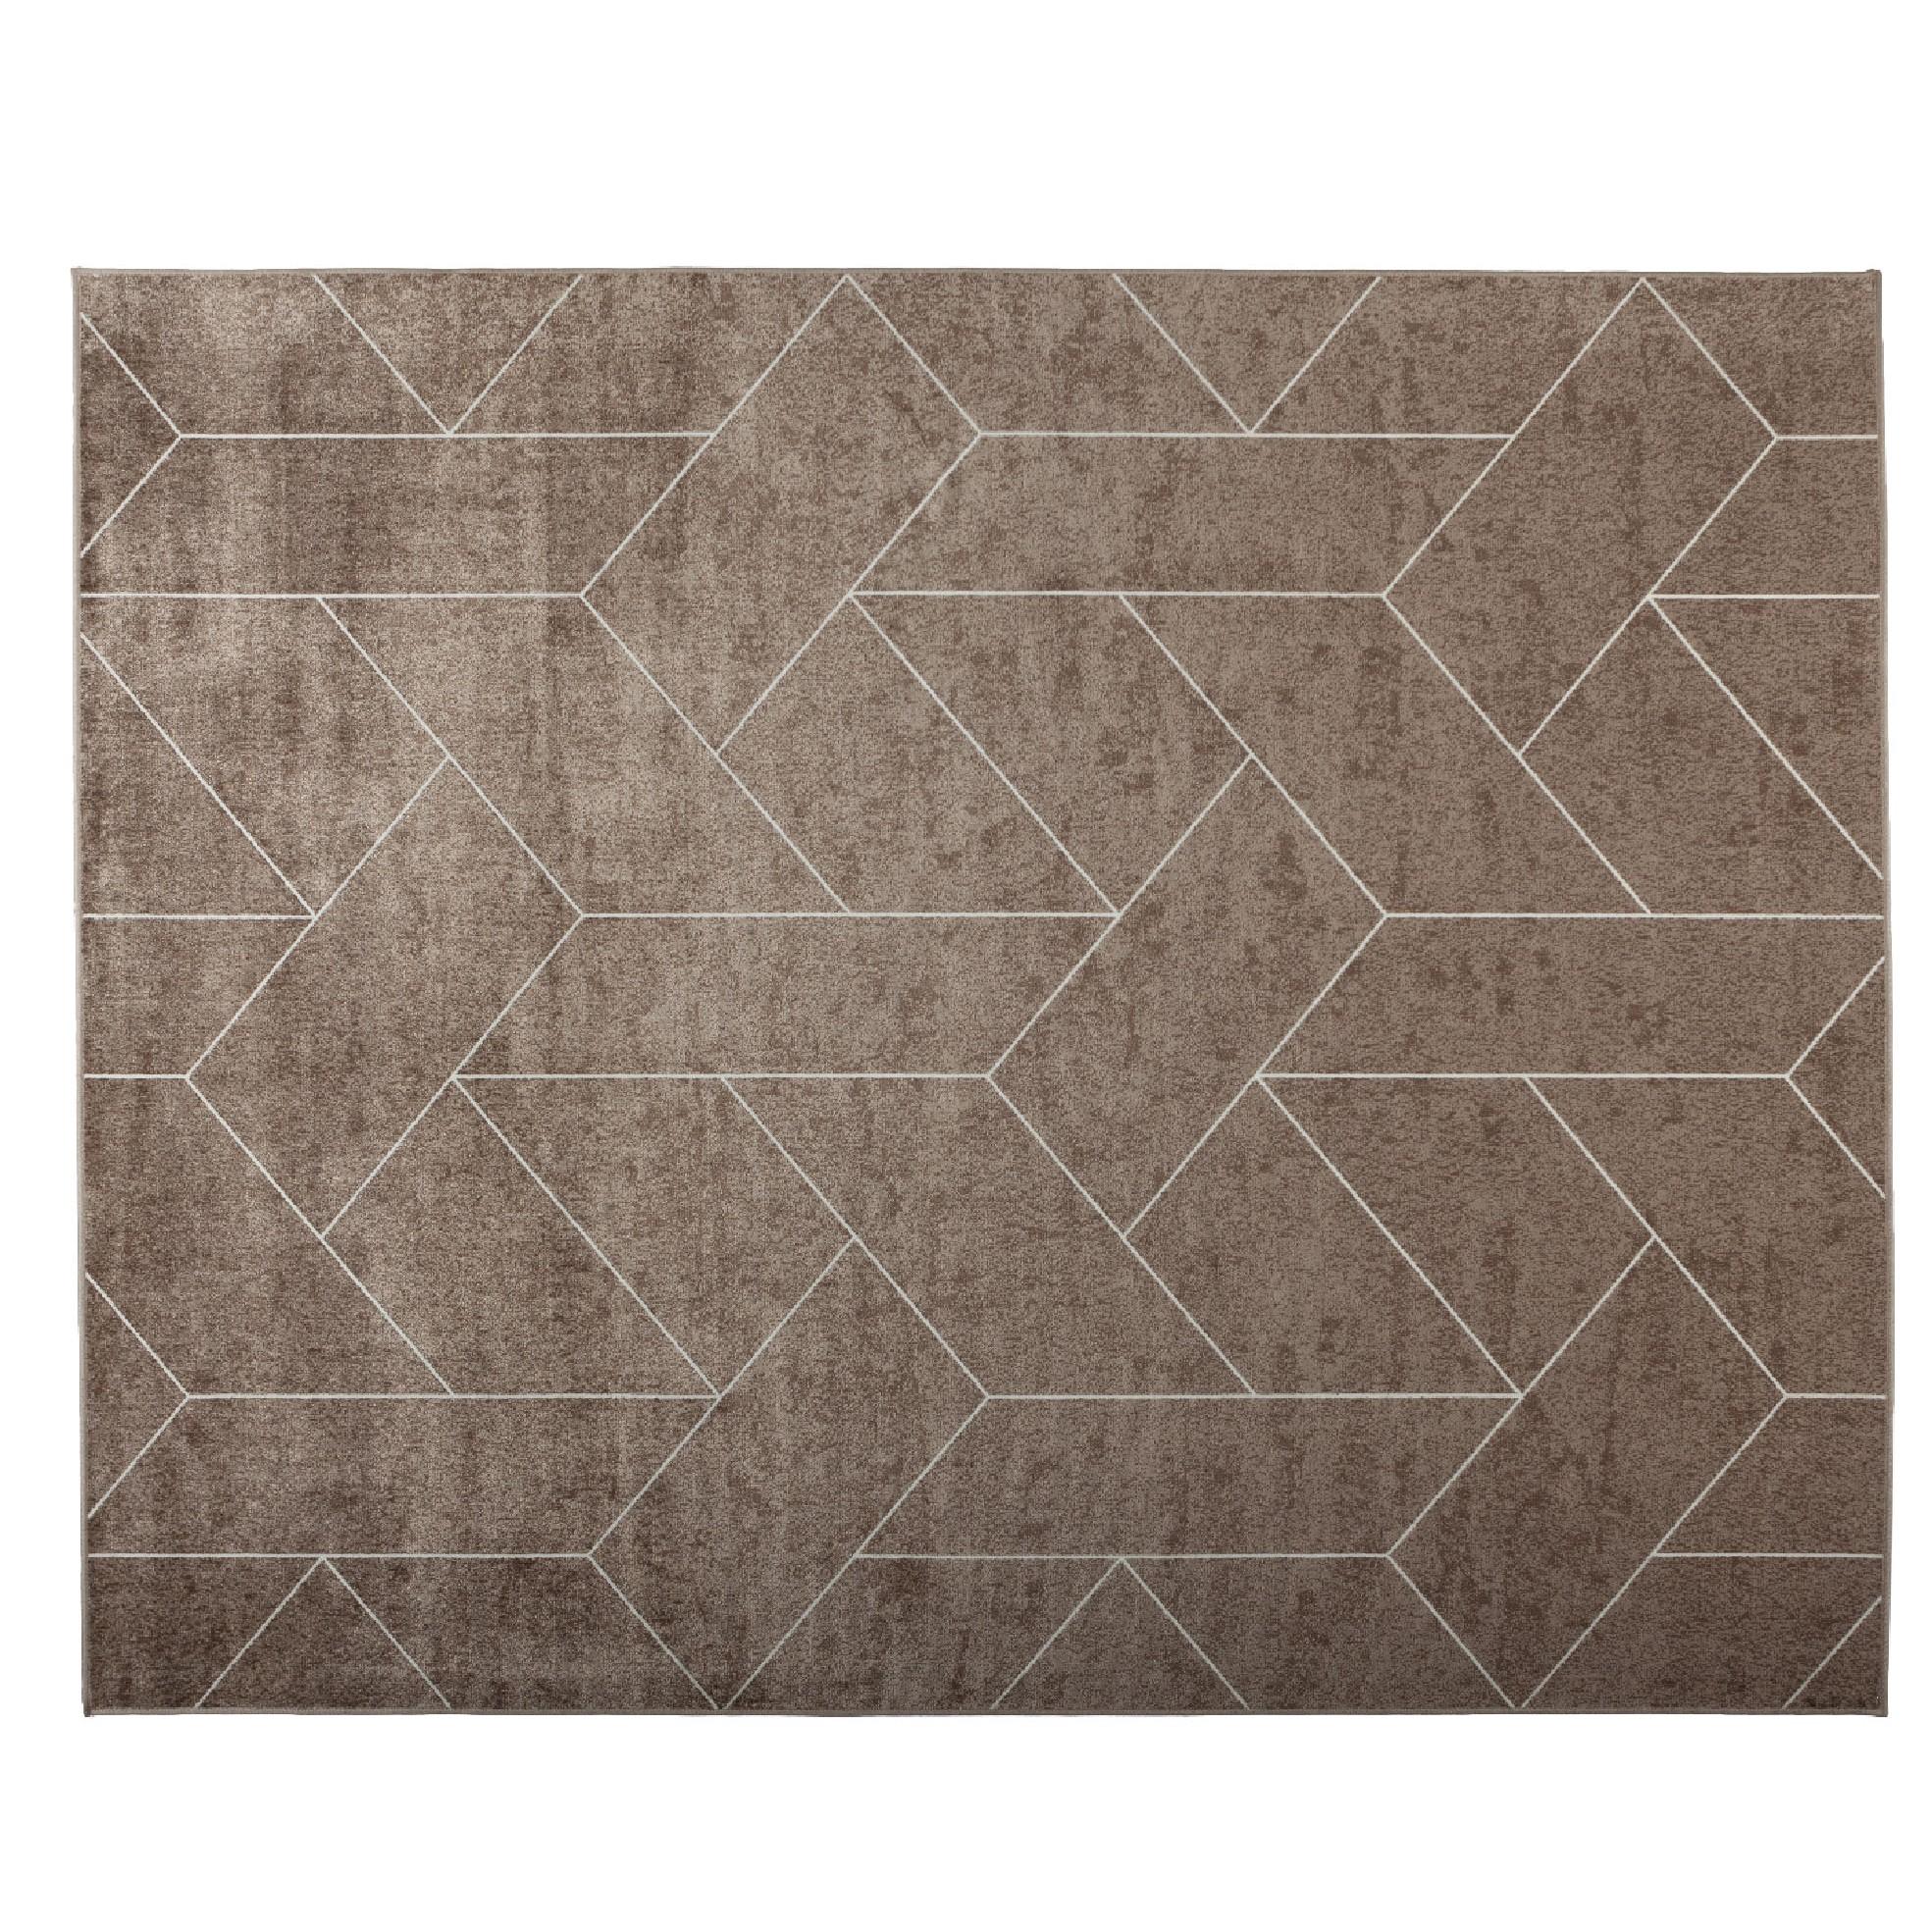 Tapete de Tecido Belga 60x100 cm 594 - Fatex